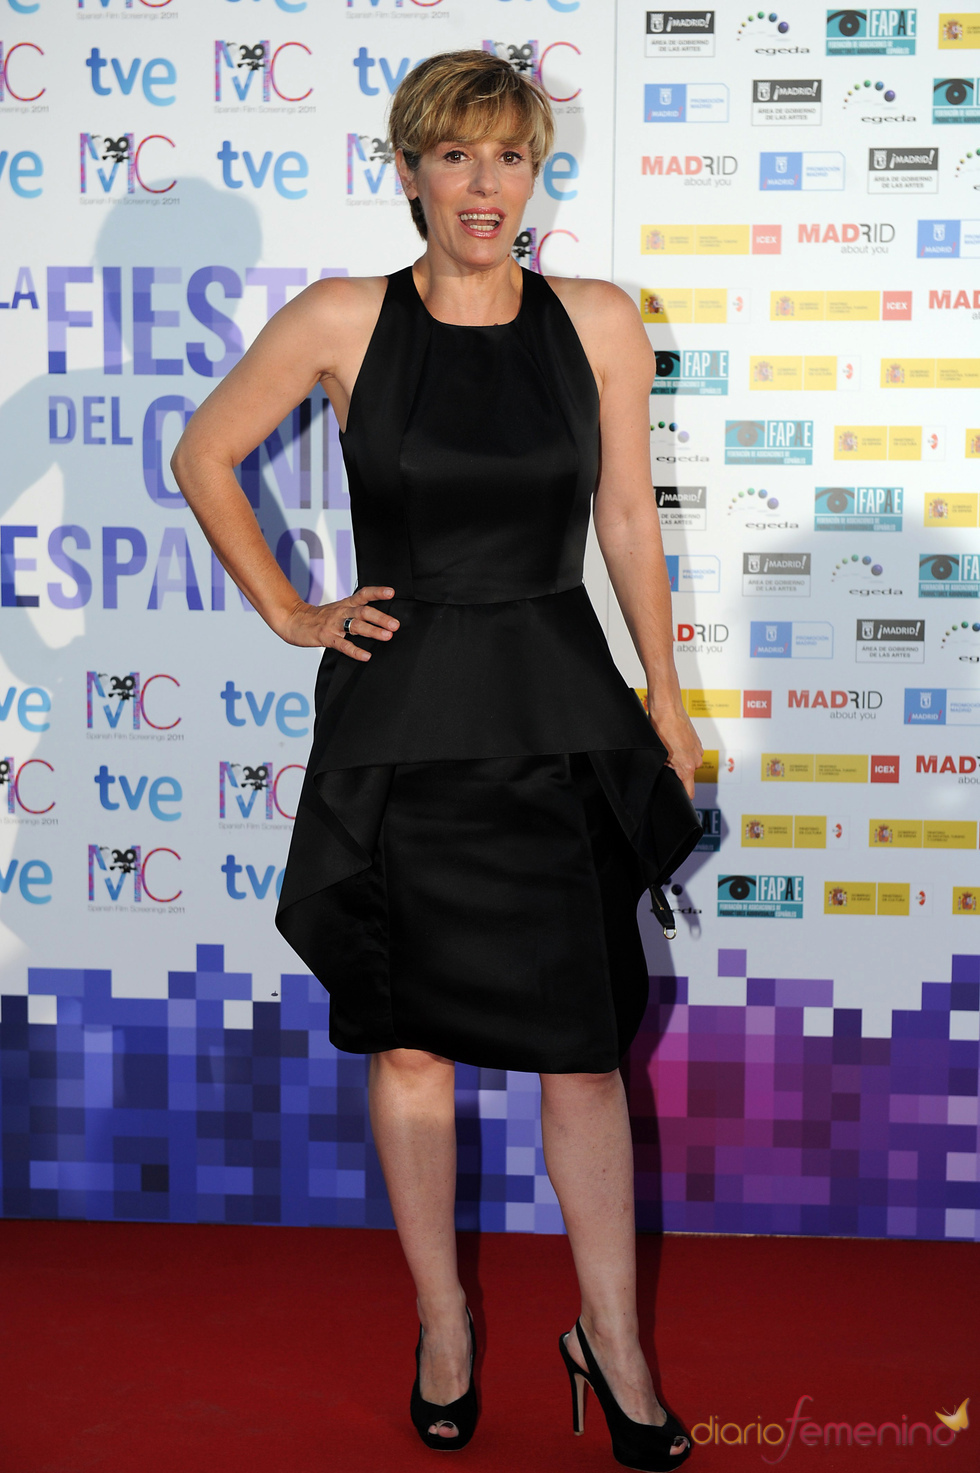 Anabel Alonso en la Fiesta del Cine español